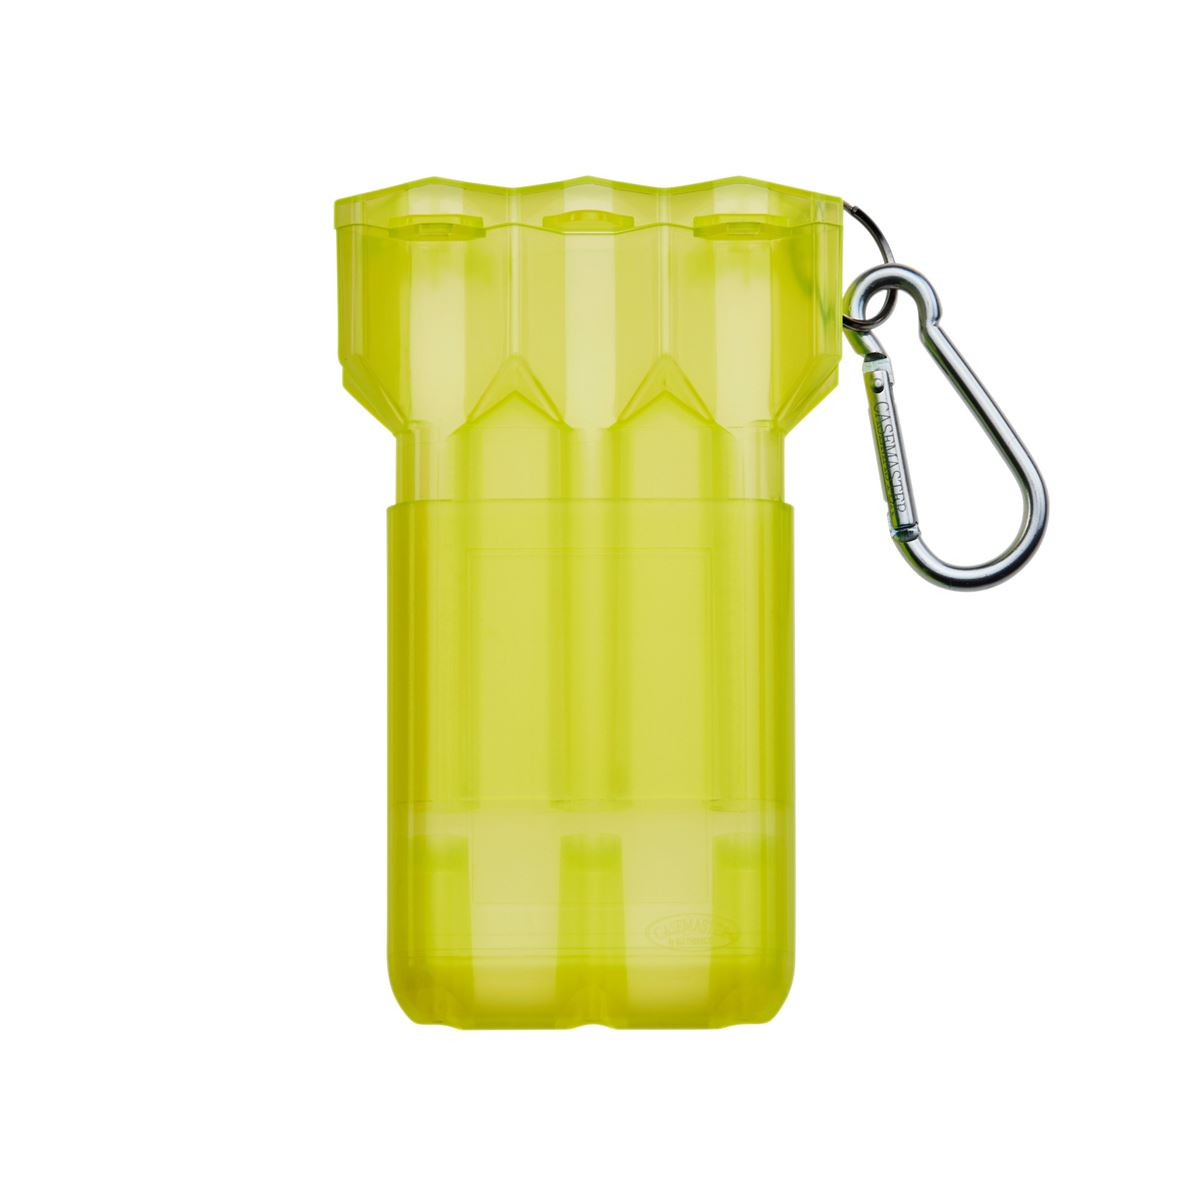 Nomad Dart Case - Neon Yellow